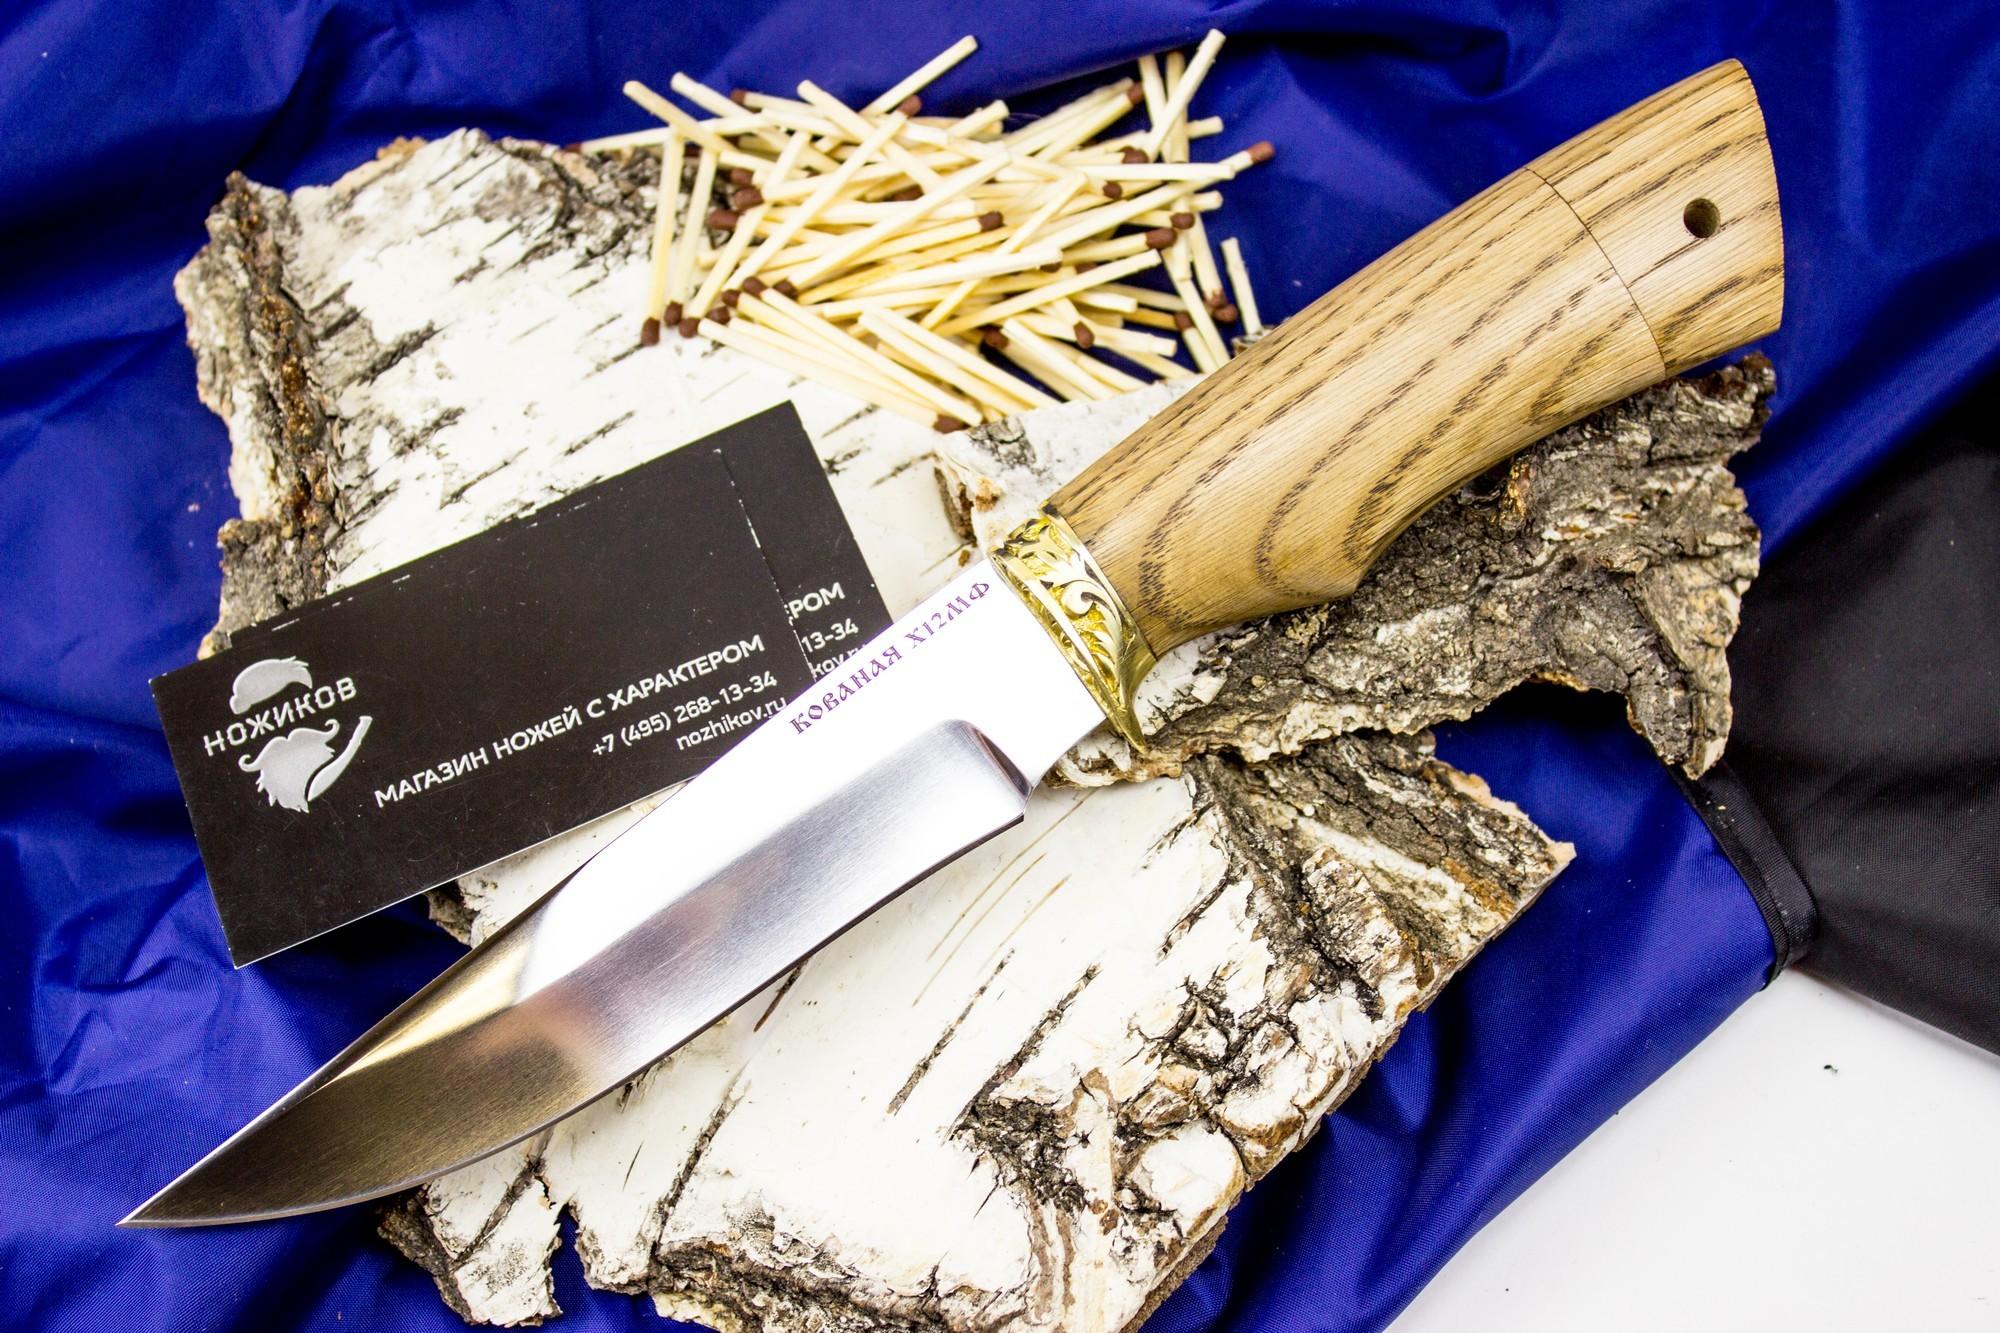 Нож Белка, сталь Х12МФ, мельхиор от Кузница Коваль